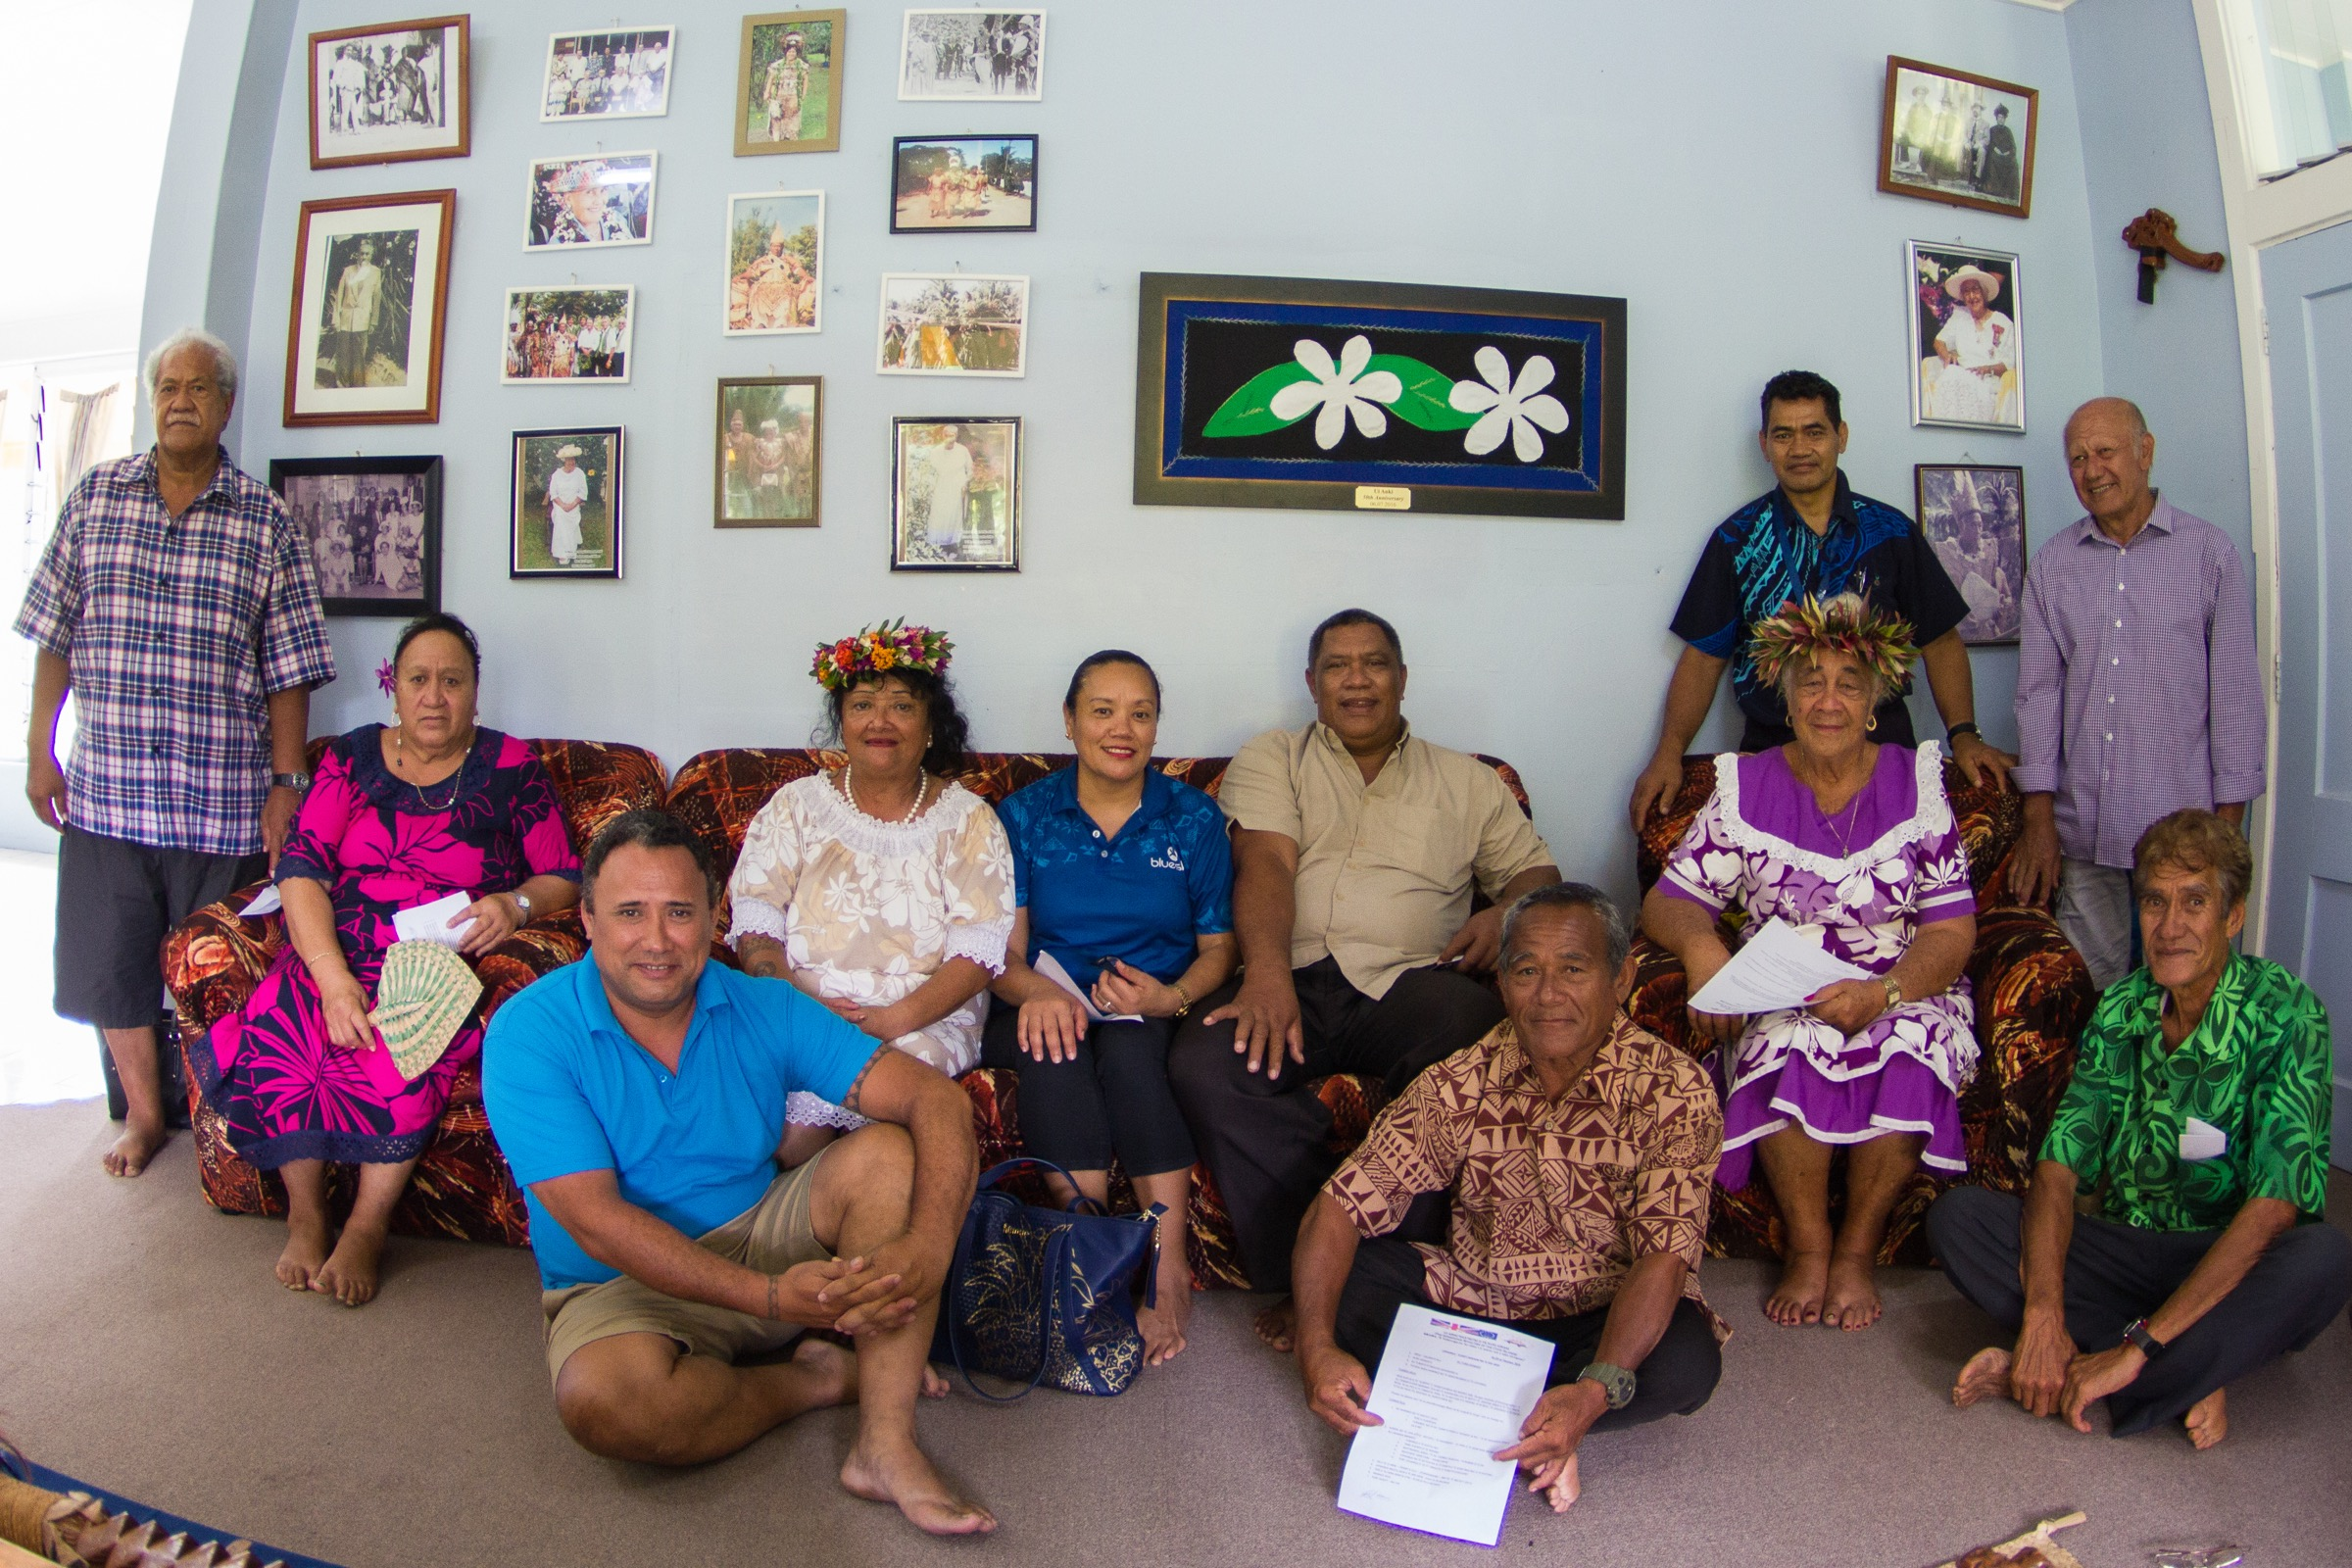 Members of the House of Ariki—Photograph by Brian Zgliczynski/100 Island Challenge